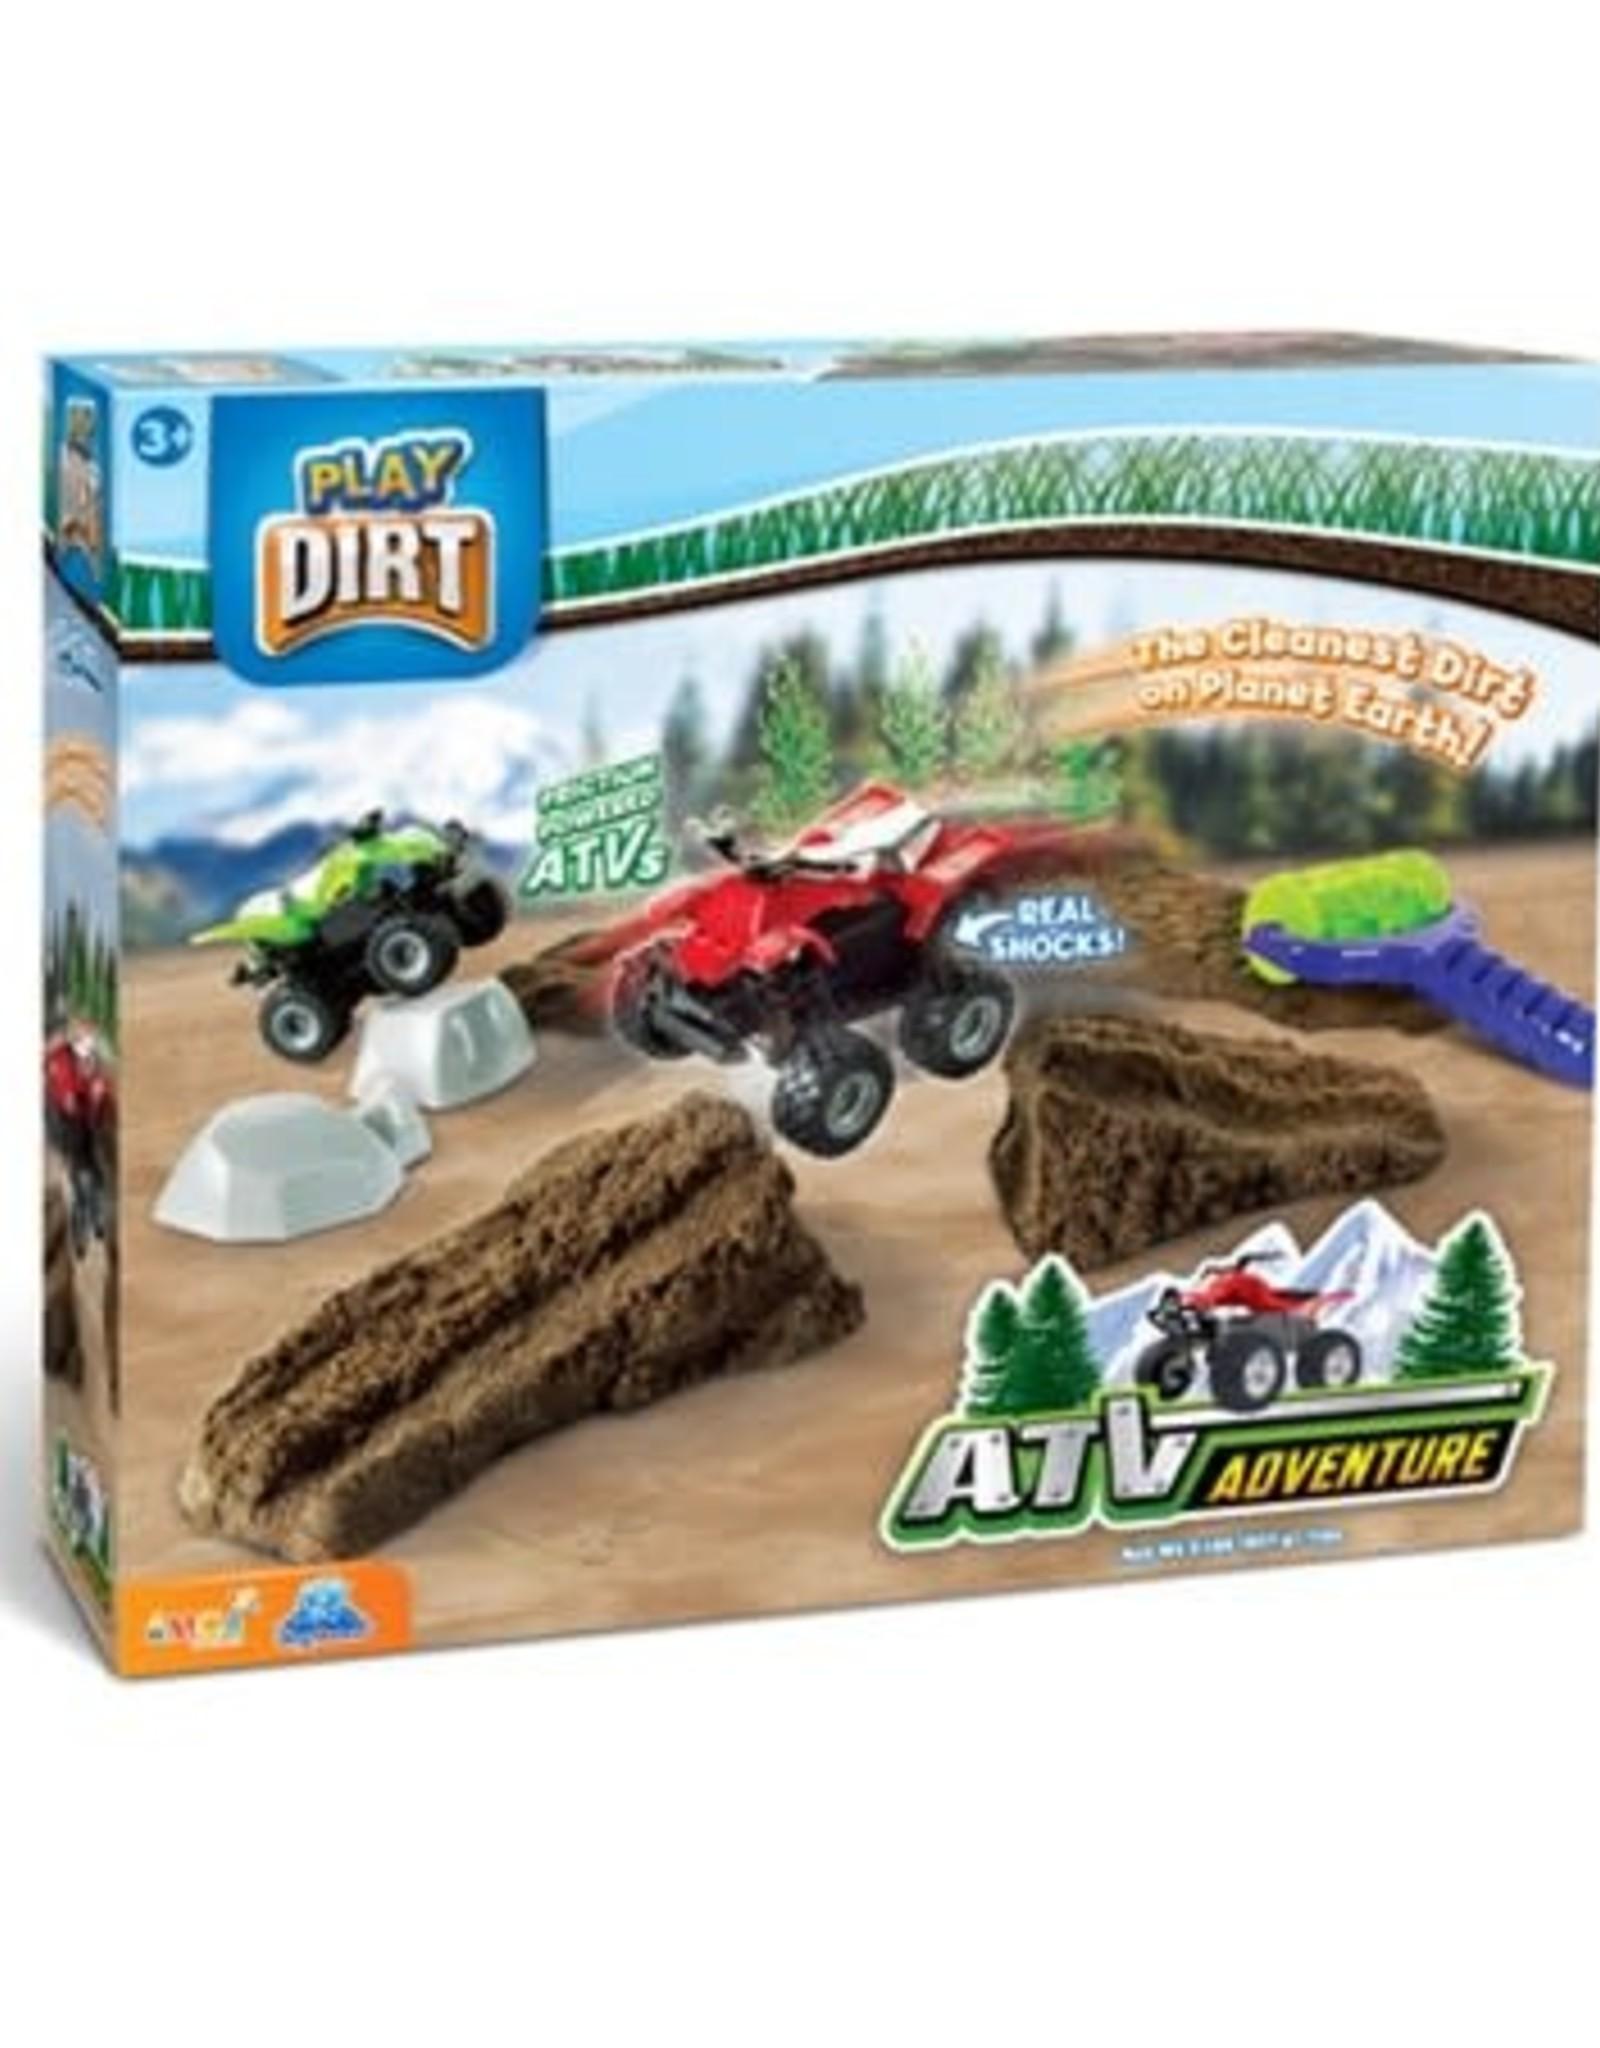 Play Dirt ATV Adventure